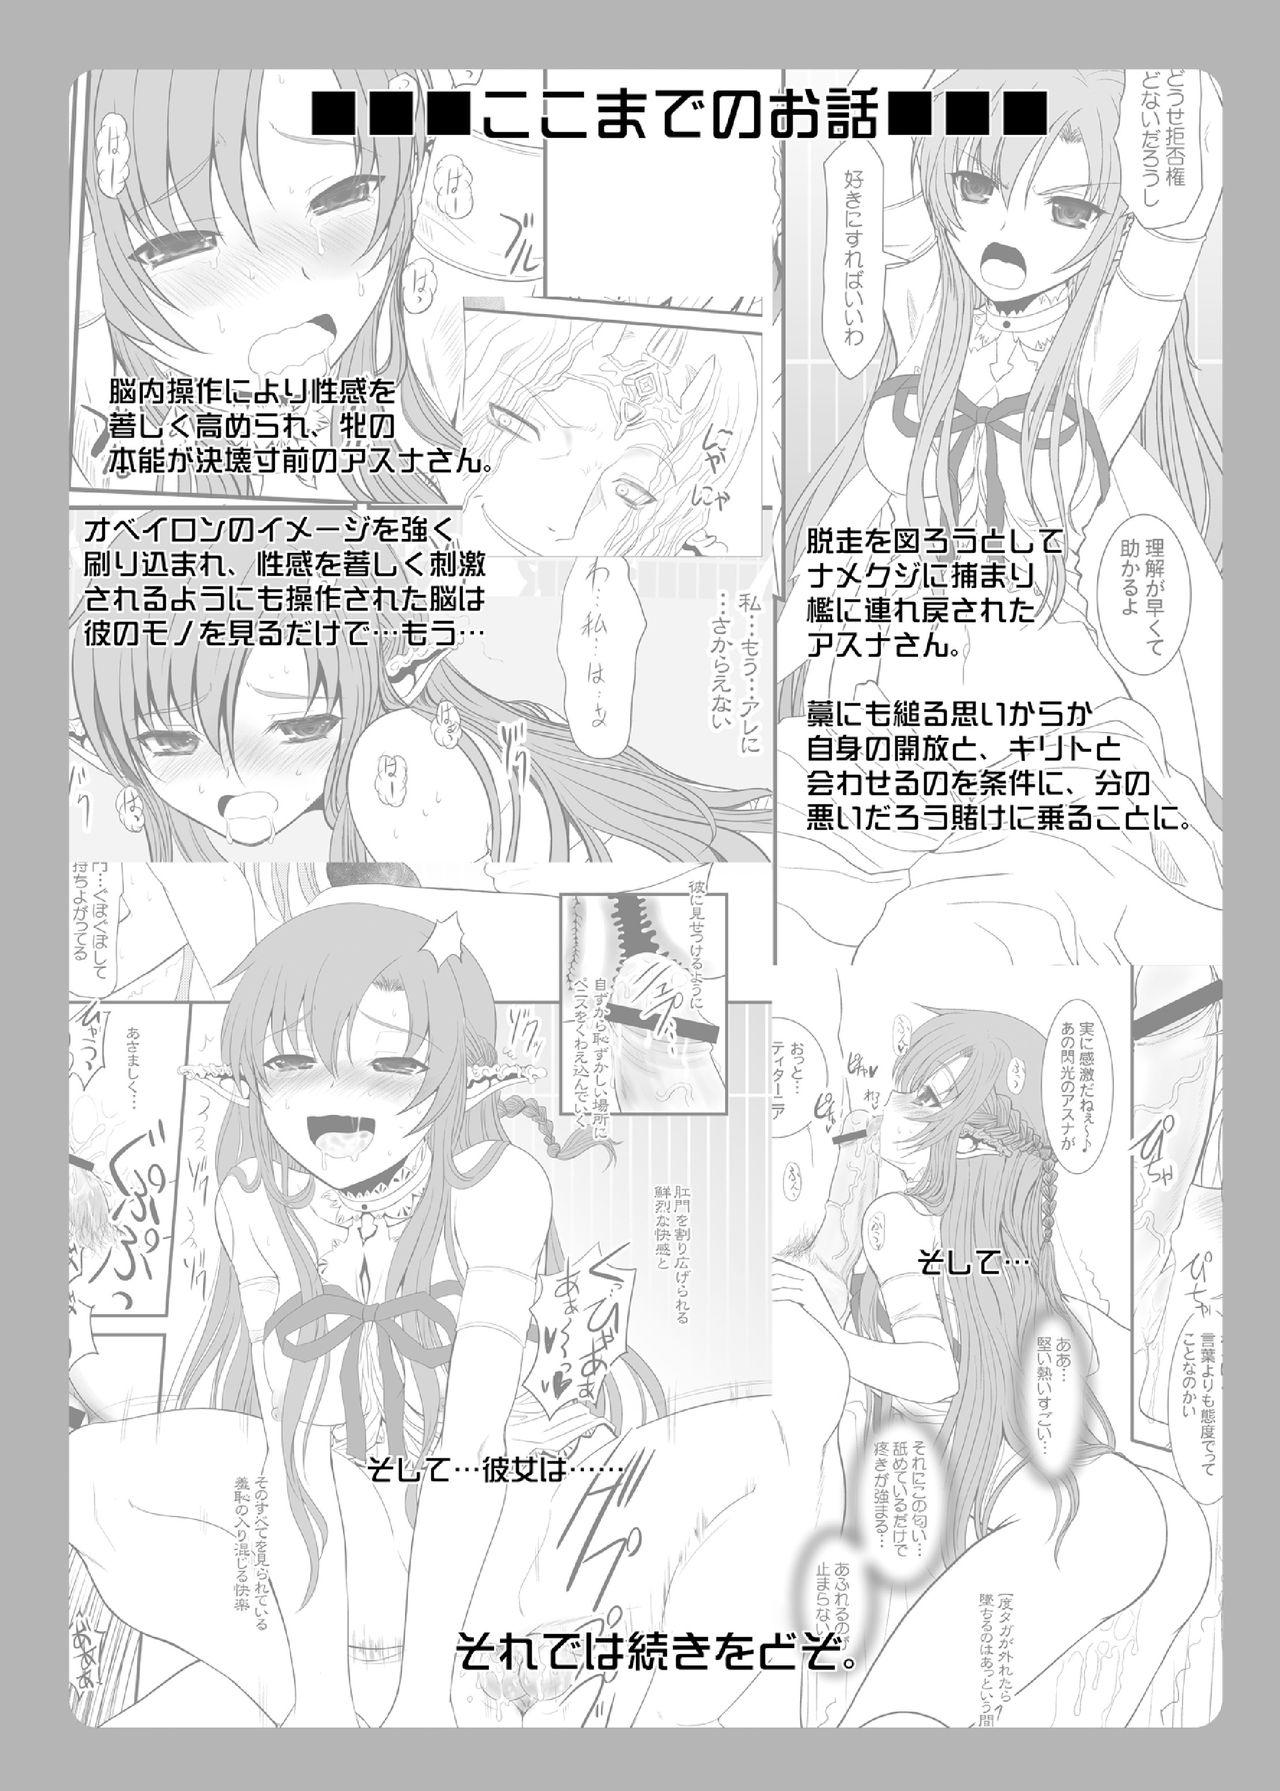 Slave Asuna On-Demand #002. PLEASURE SLAVE. 2